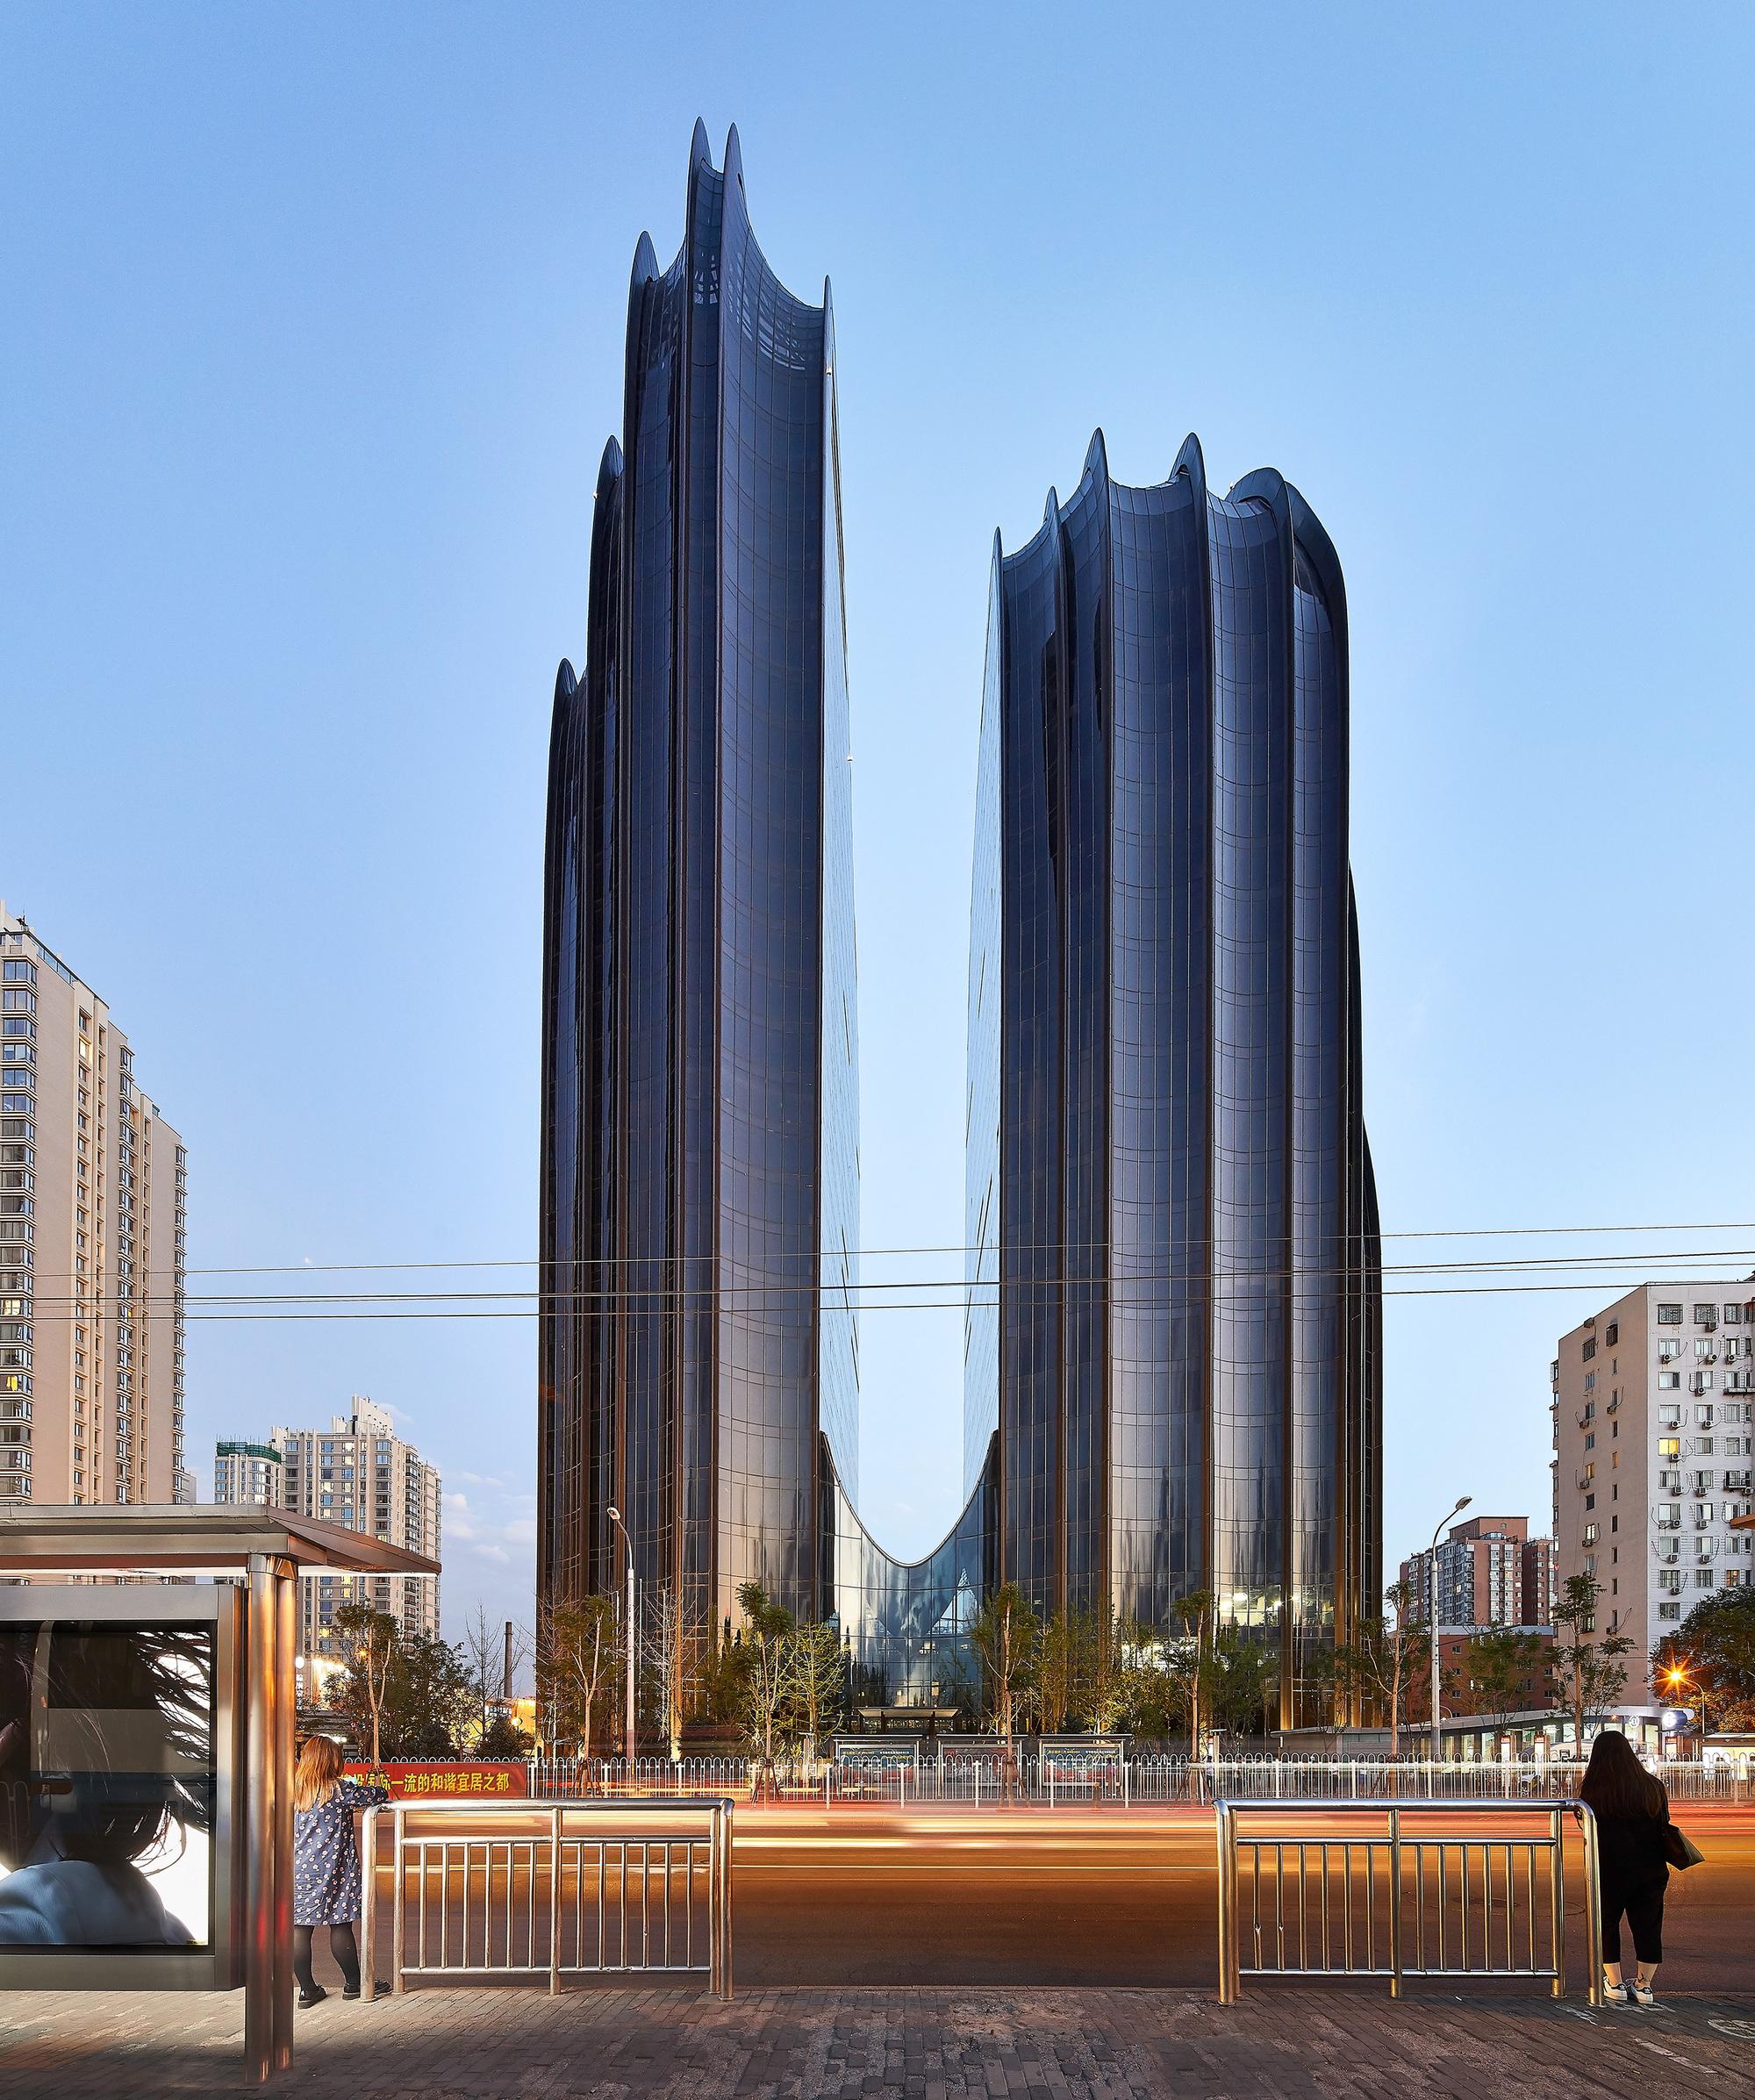 Alien Design – Chaoyang Park Plaza, Beijing, China [OS] [2000×2393]